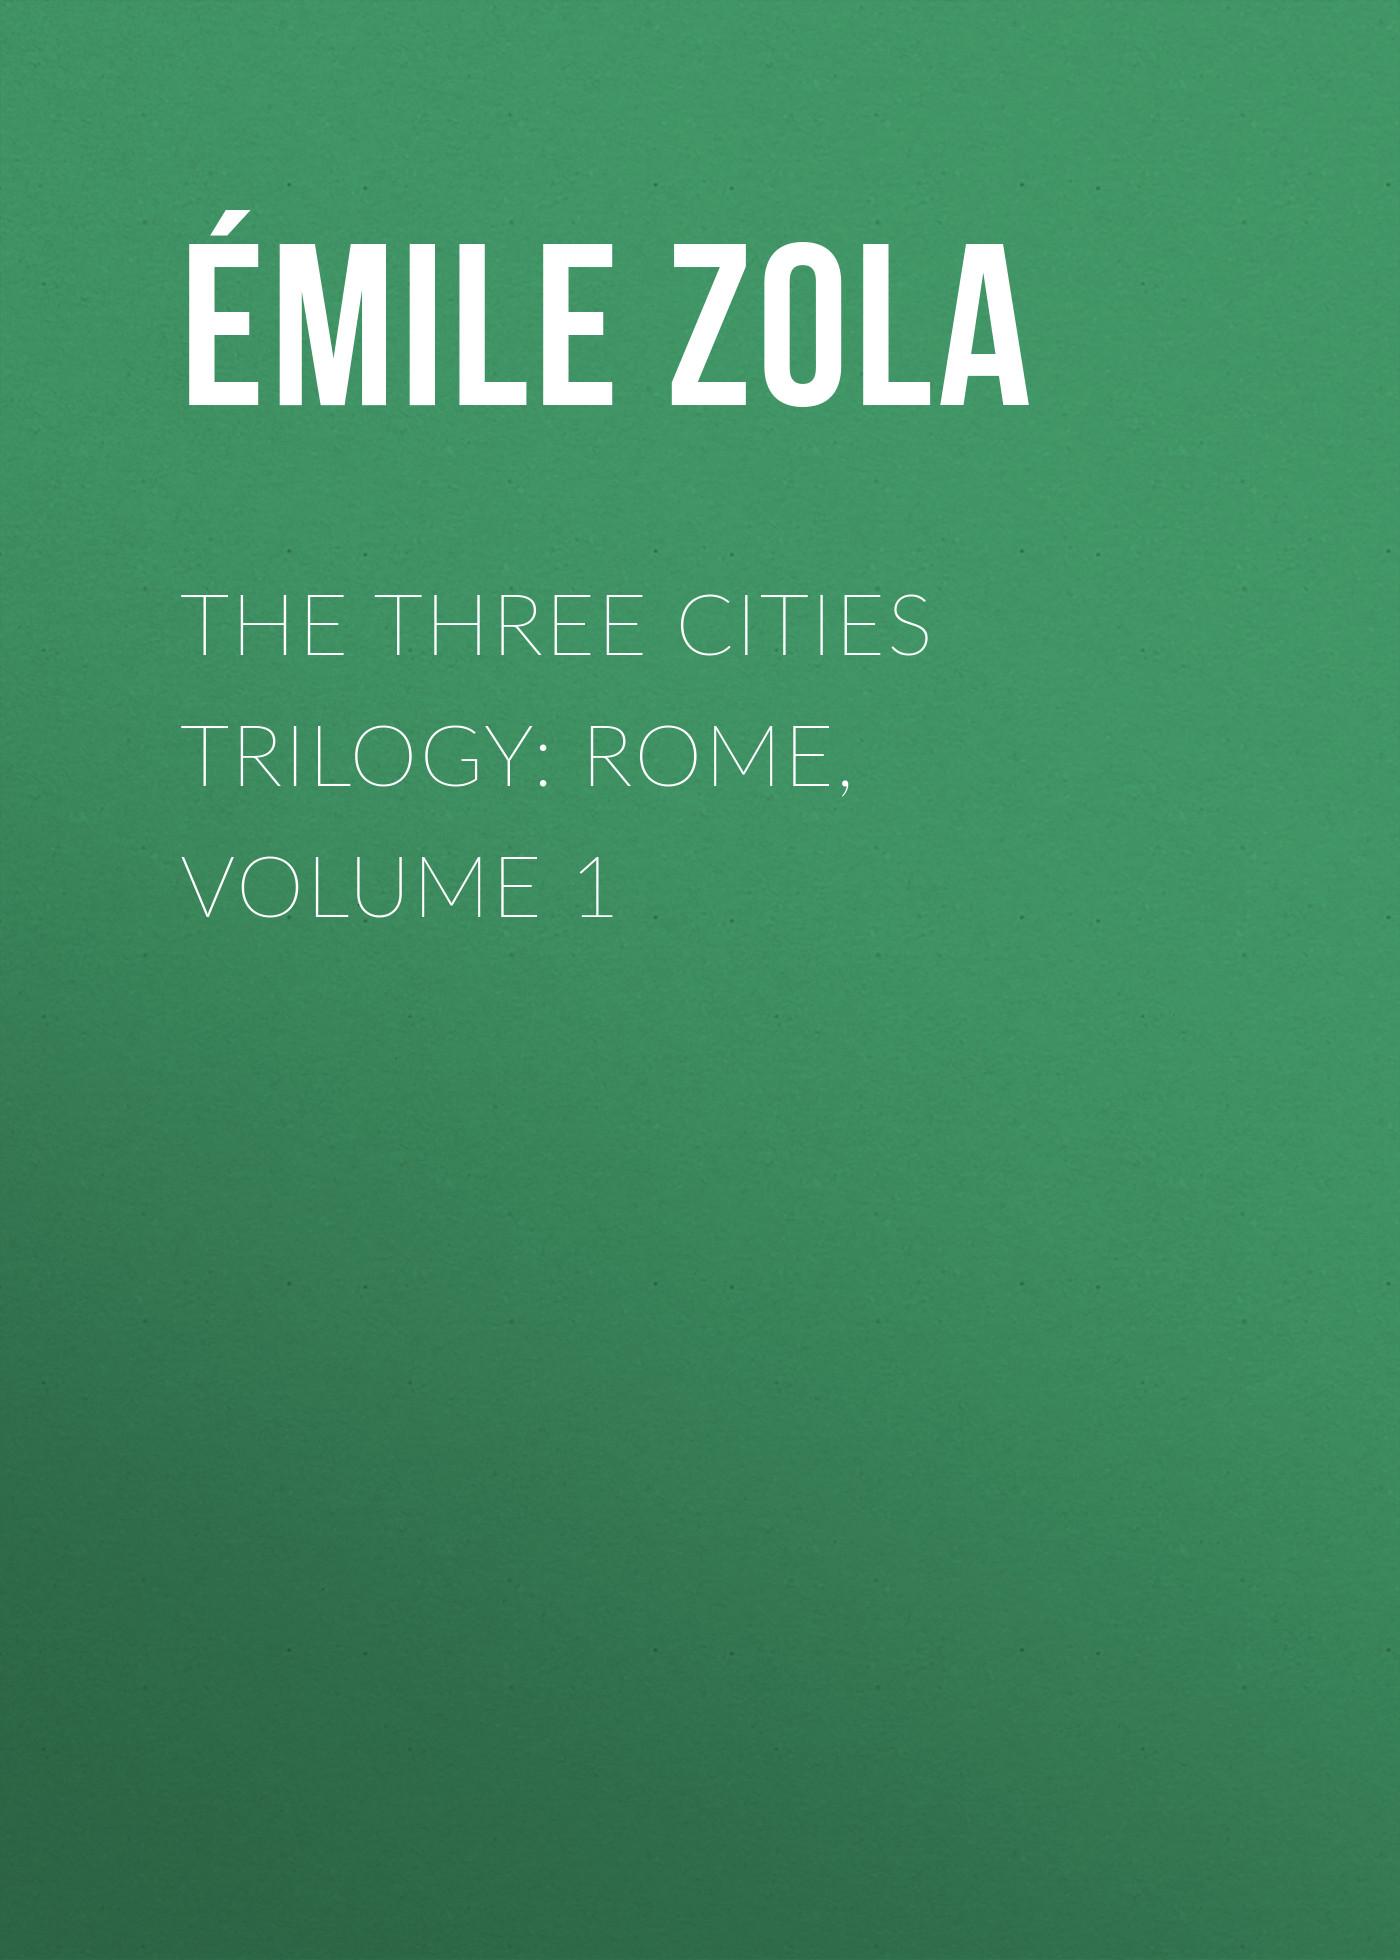 Эмиль Золя The Three Cities Trilogy: Rome, Volume 1 эмиль золя the three cities trilogy rome volume 5